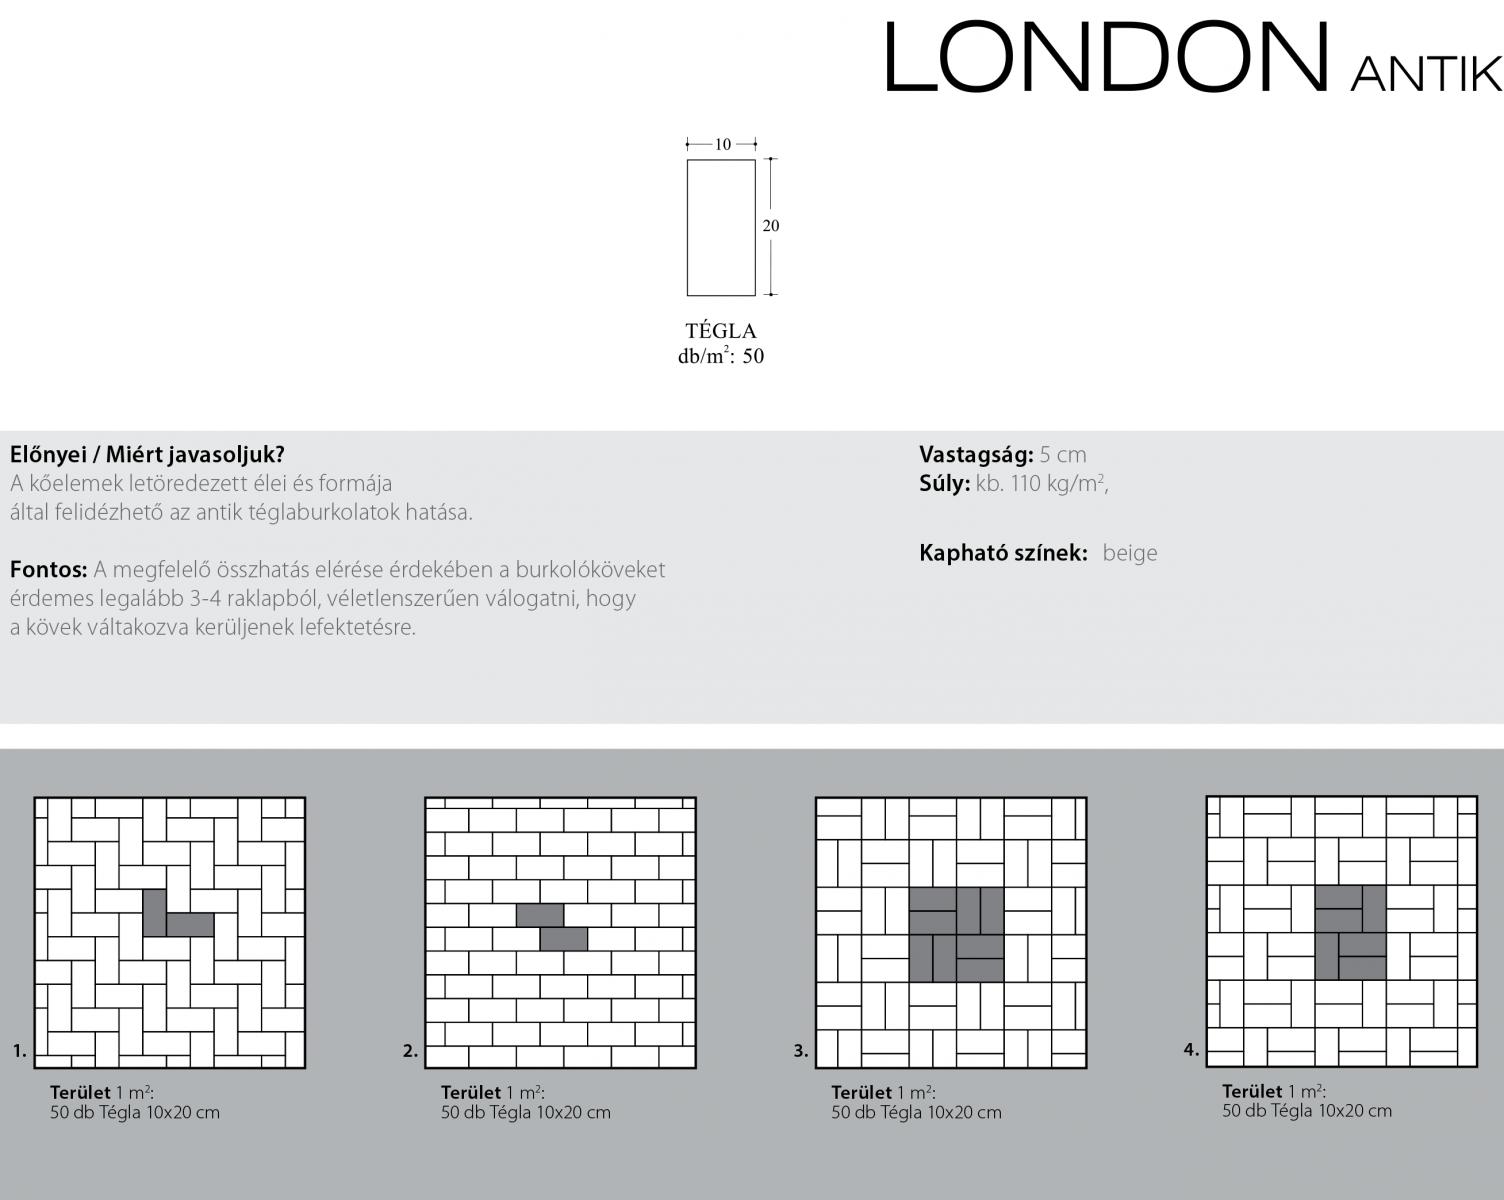 London antik technikai információi